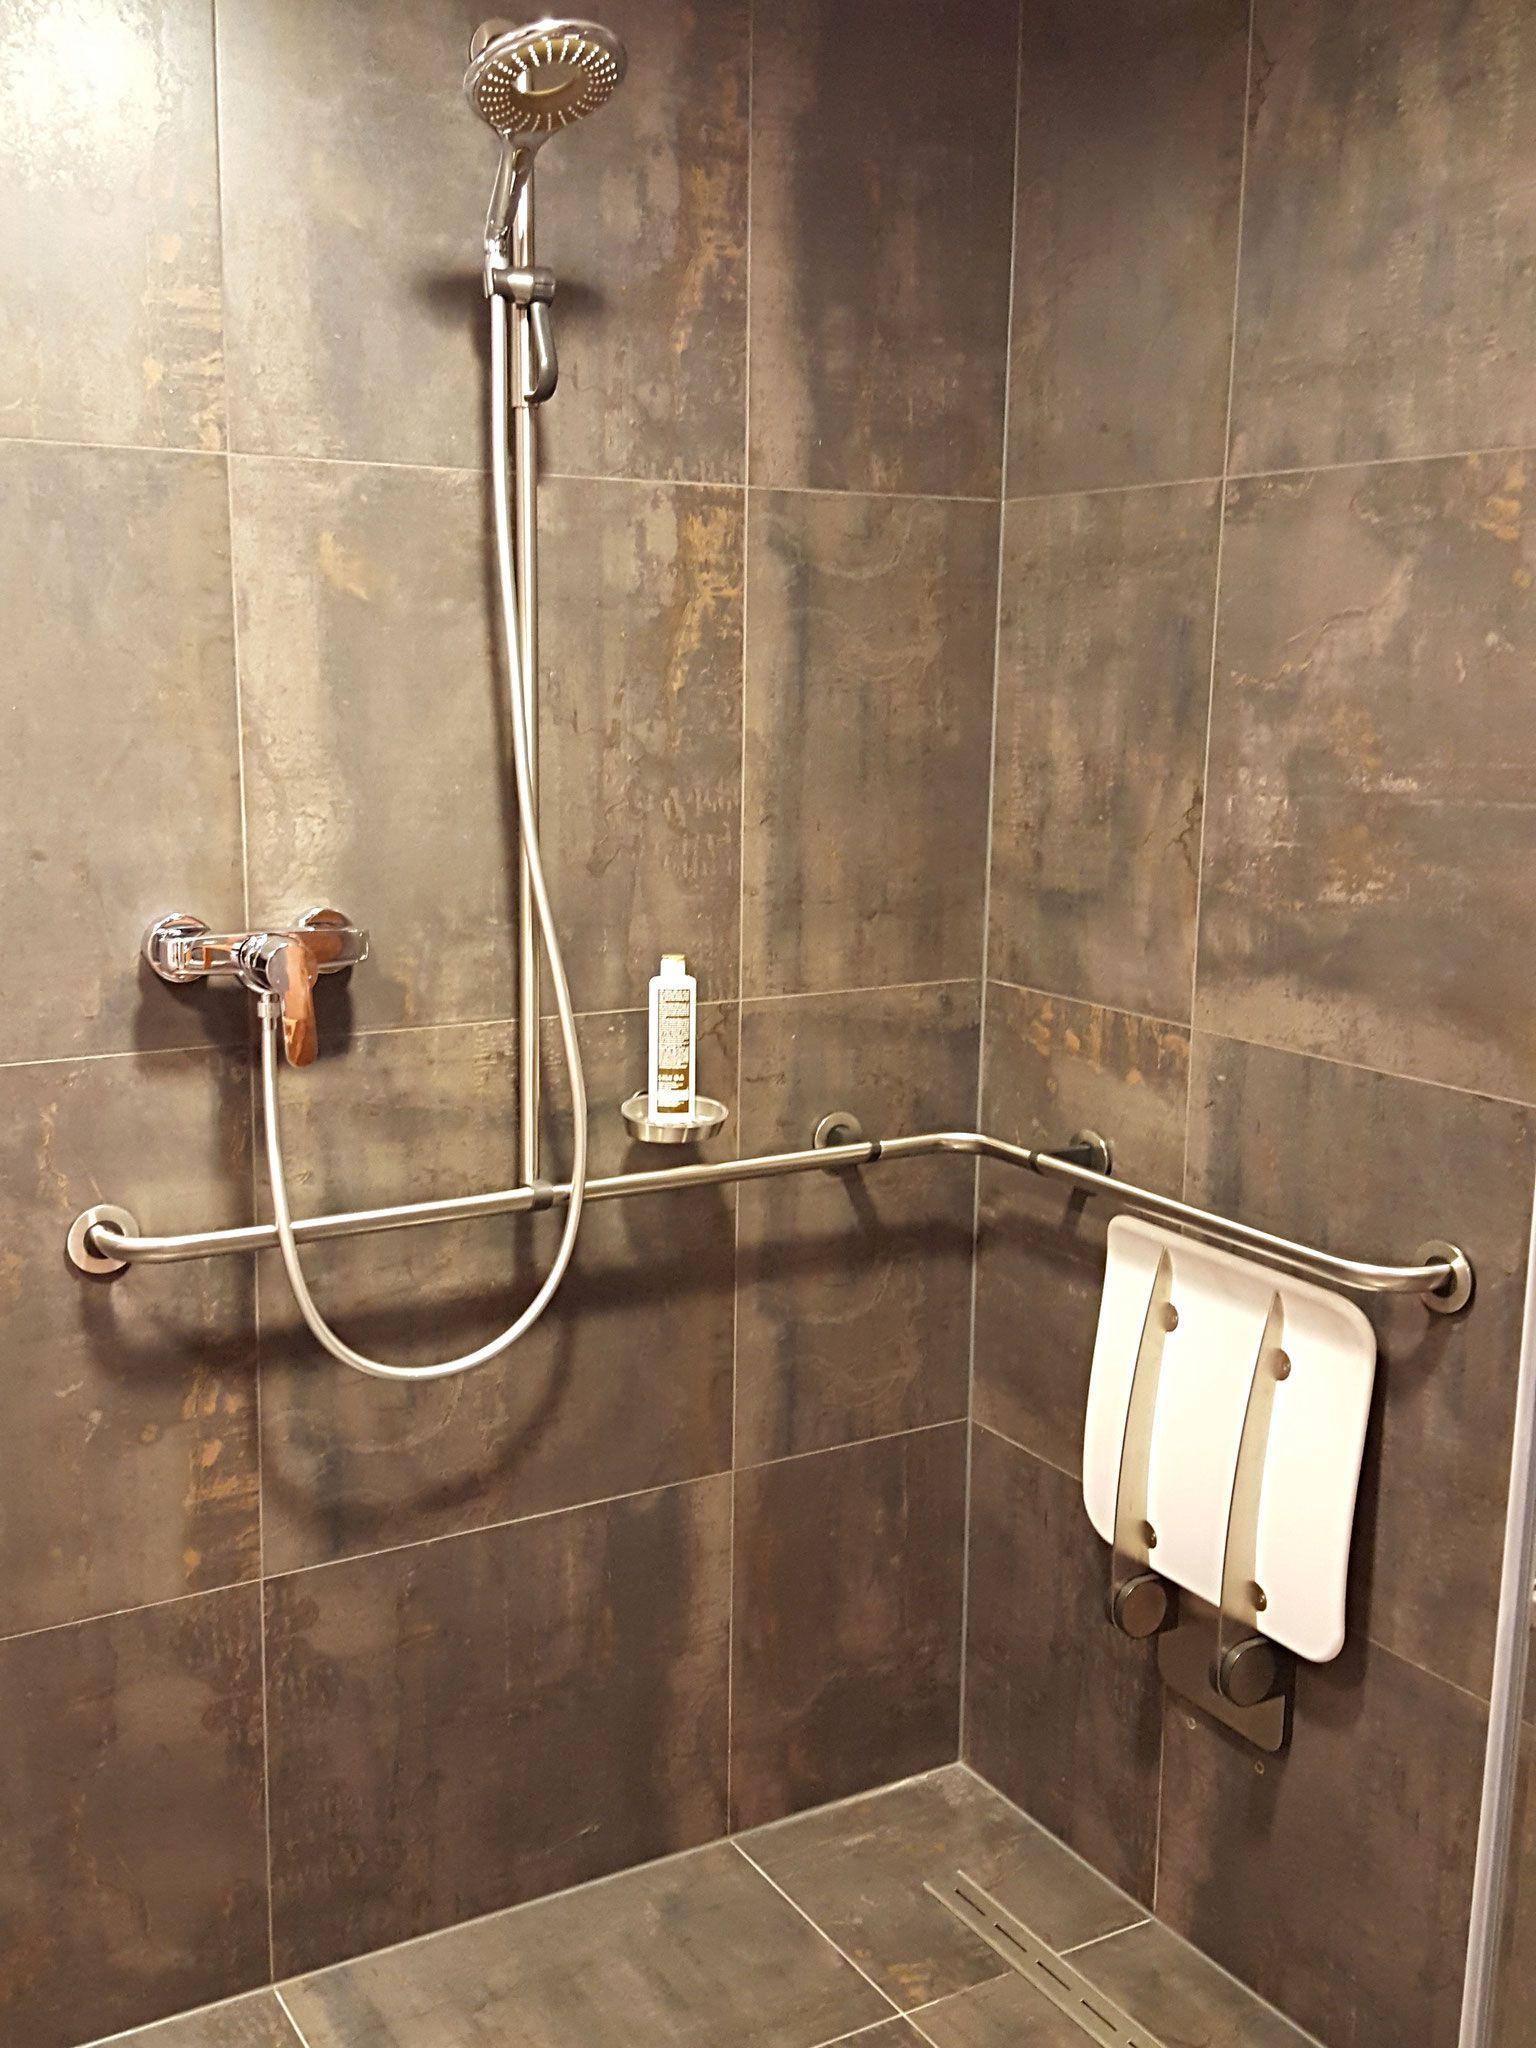 Full Size of Behindertengerechte Dusche Behindertengerechtes Bad Hsk Duschen Grohe Begehbare Ohne Tür Komplett Set Ebenerdig Haltegriff Ebenerdige Kosten Hüppe Küche Dusche Behindertengerechte Dusche